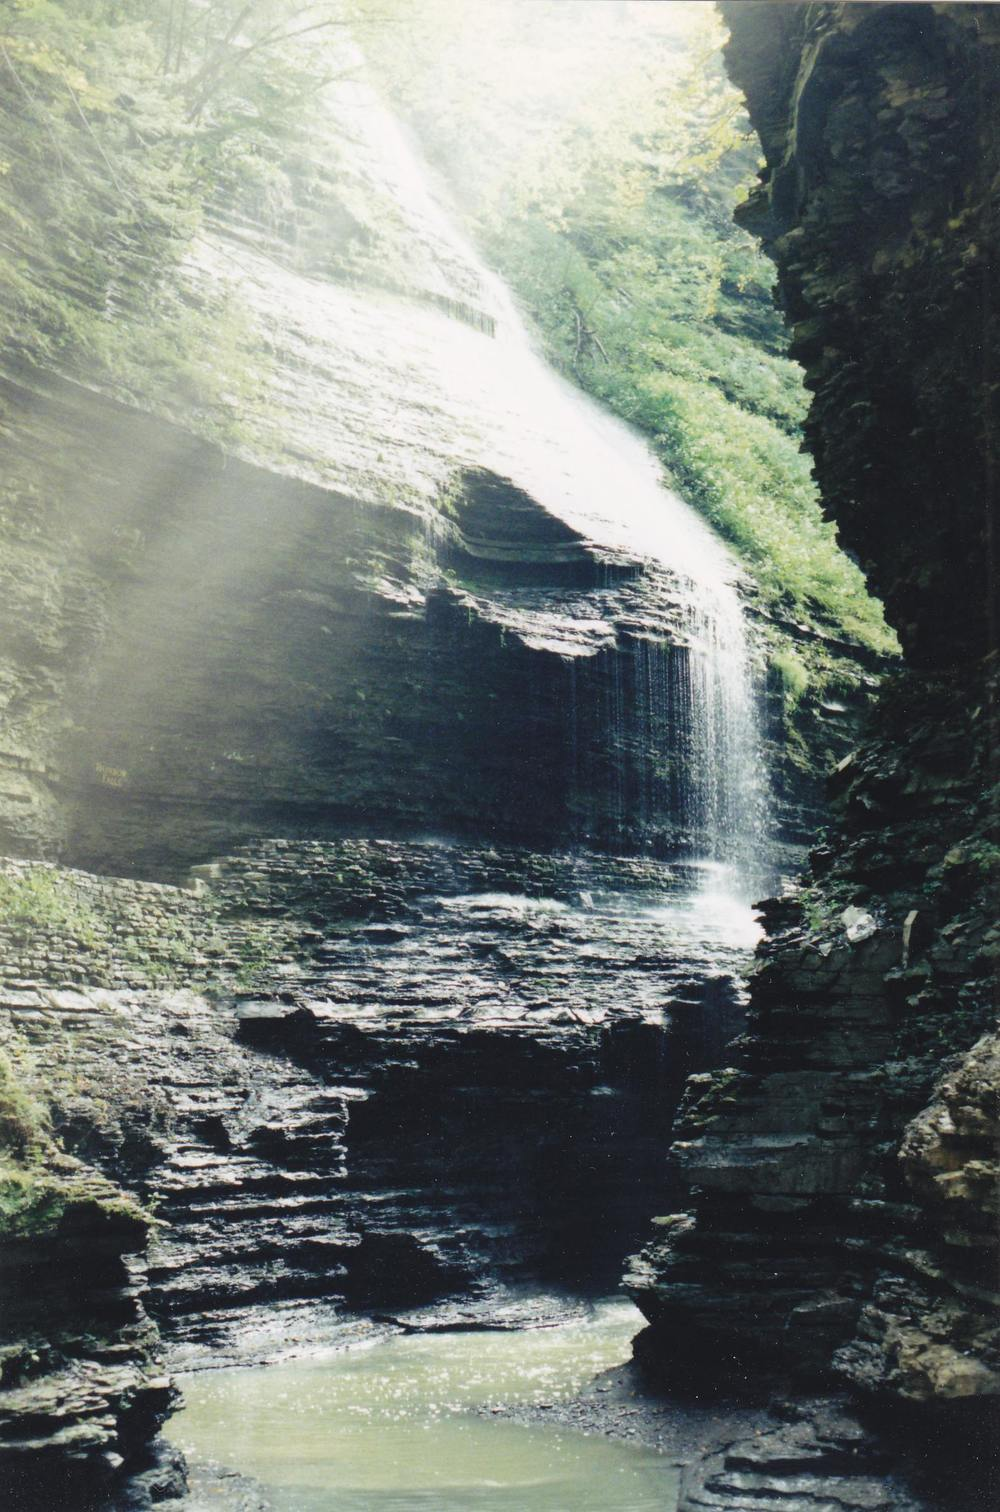 Waterfall -Watkins Glen, NY - 2003